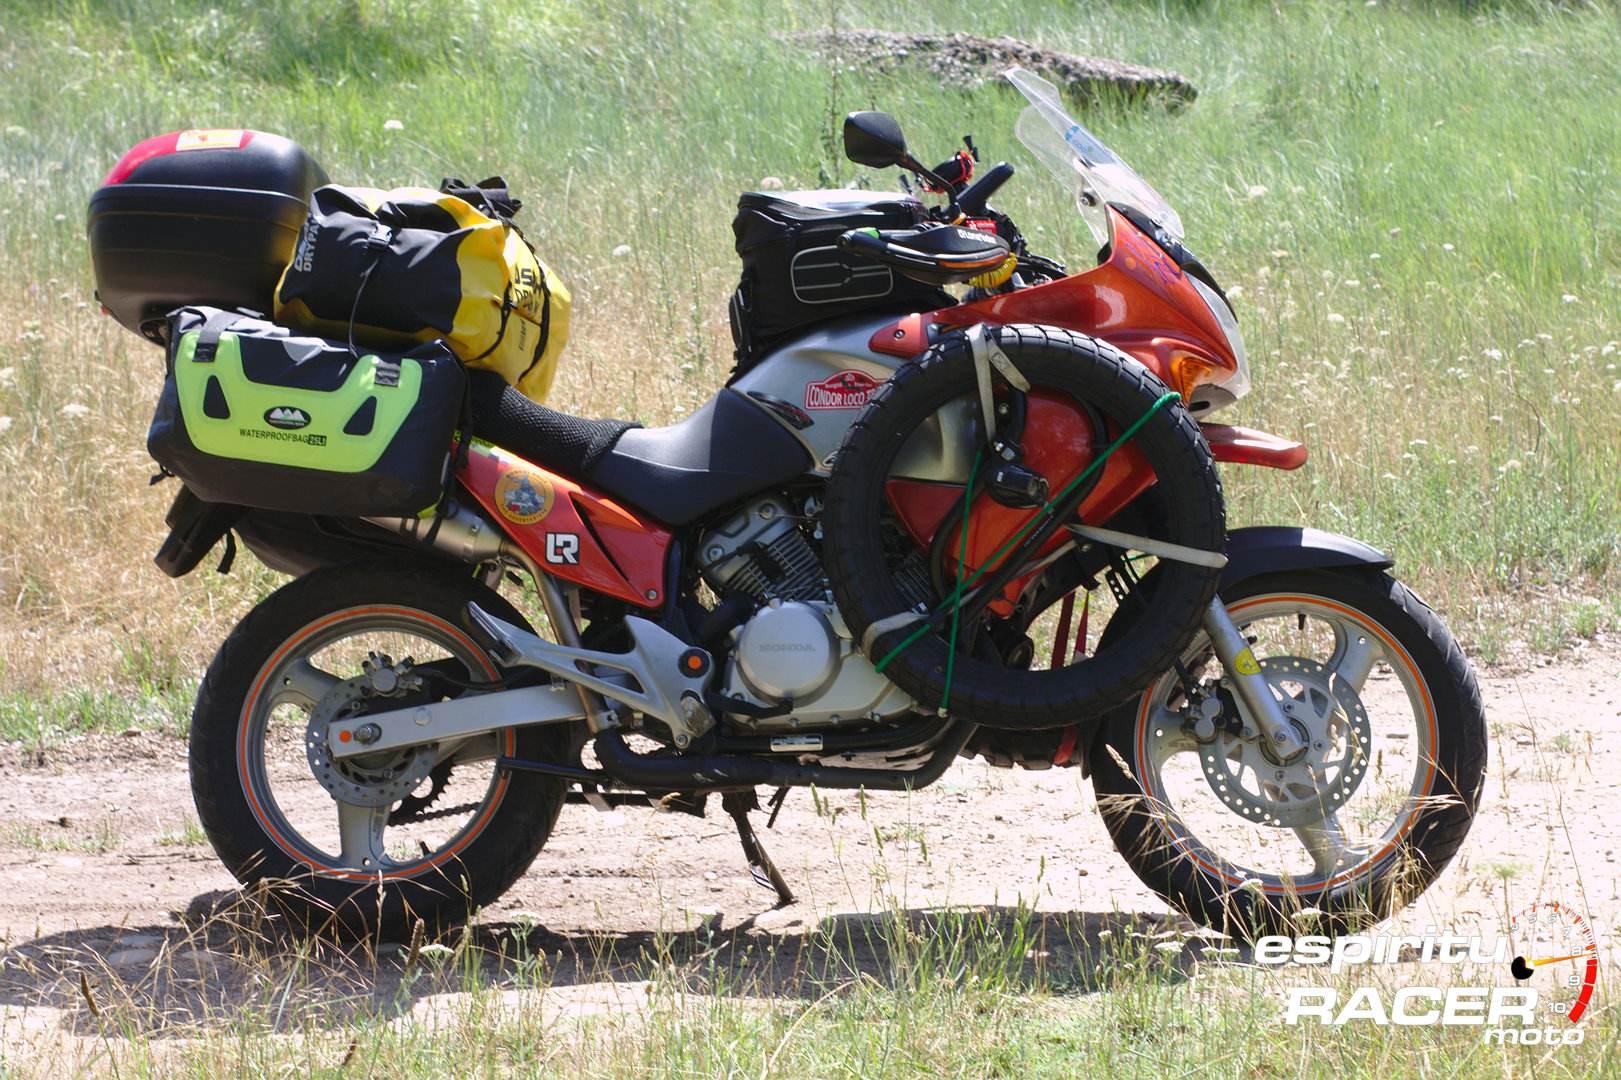 Pedro a Mongolia espirituRACER moto 08